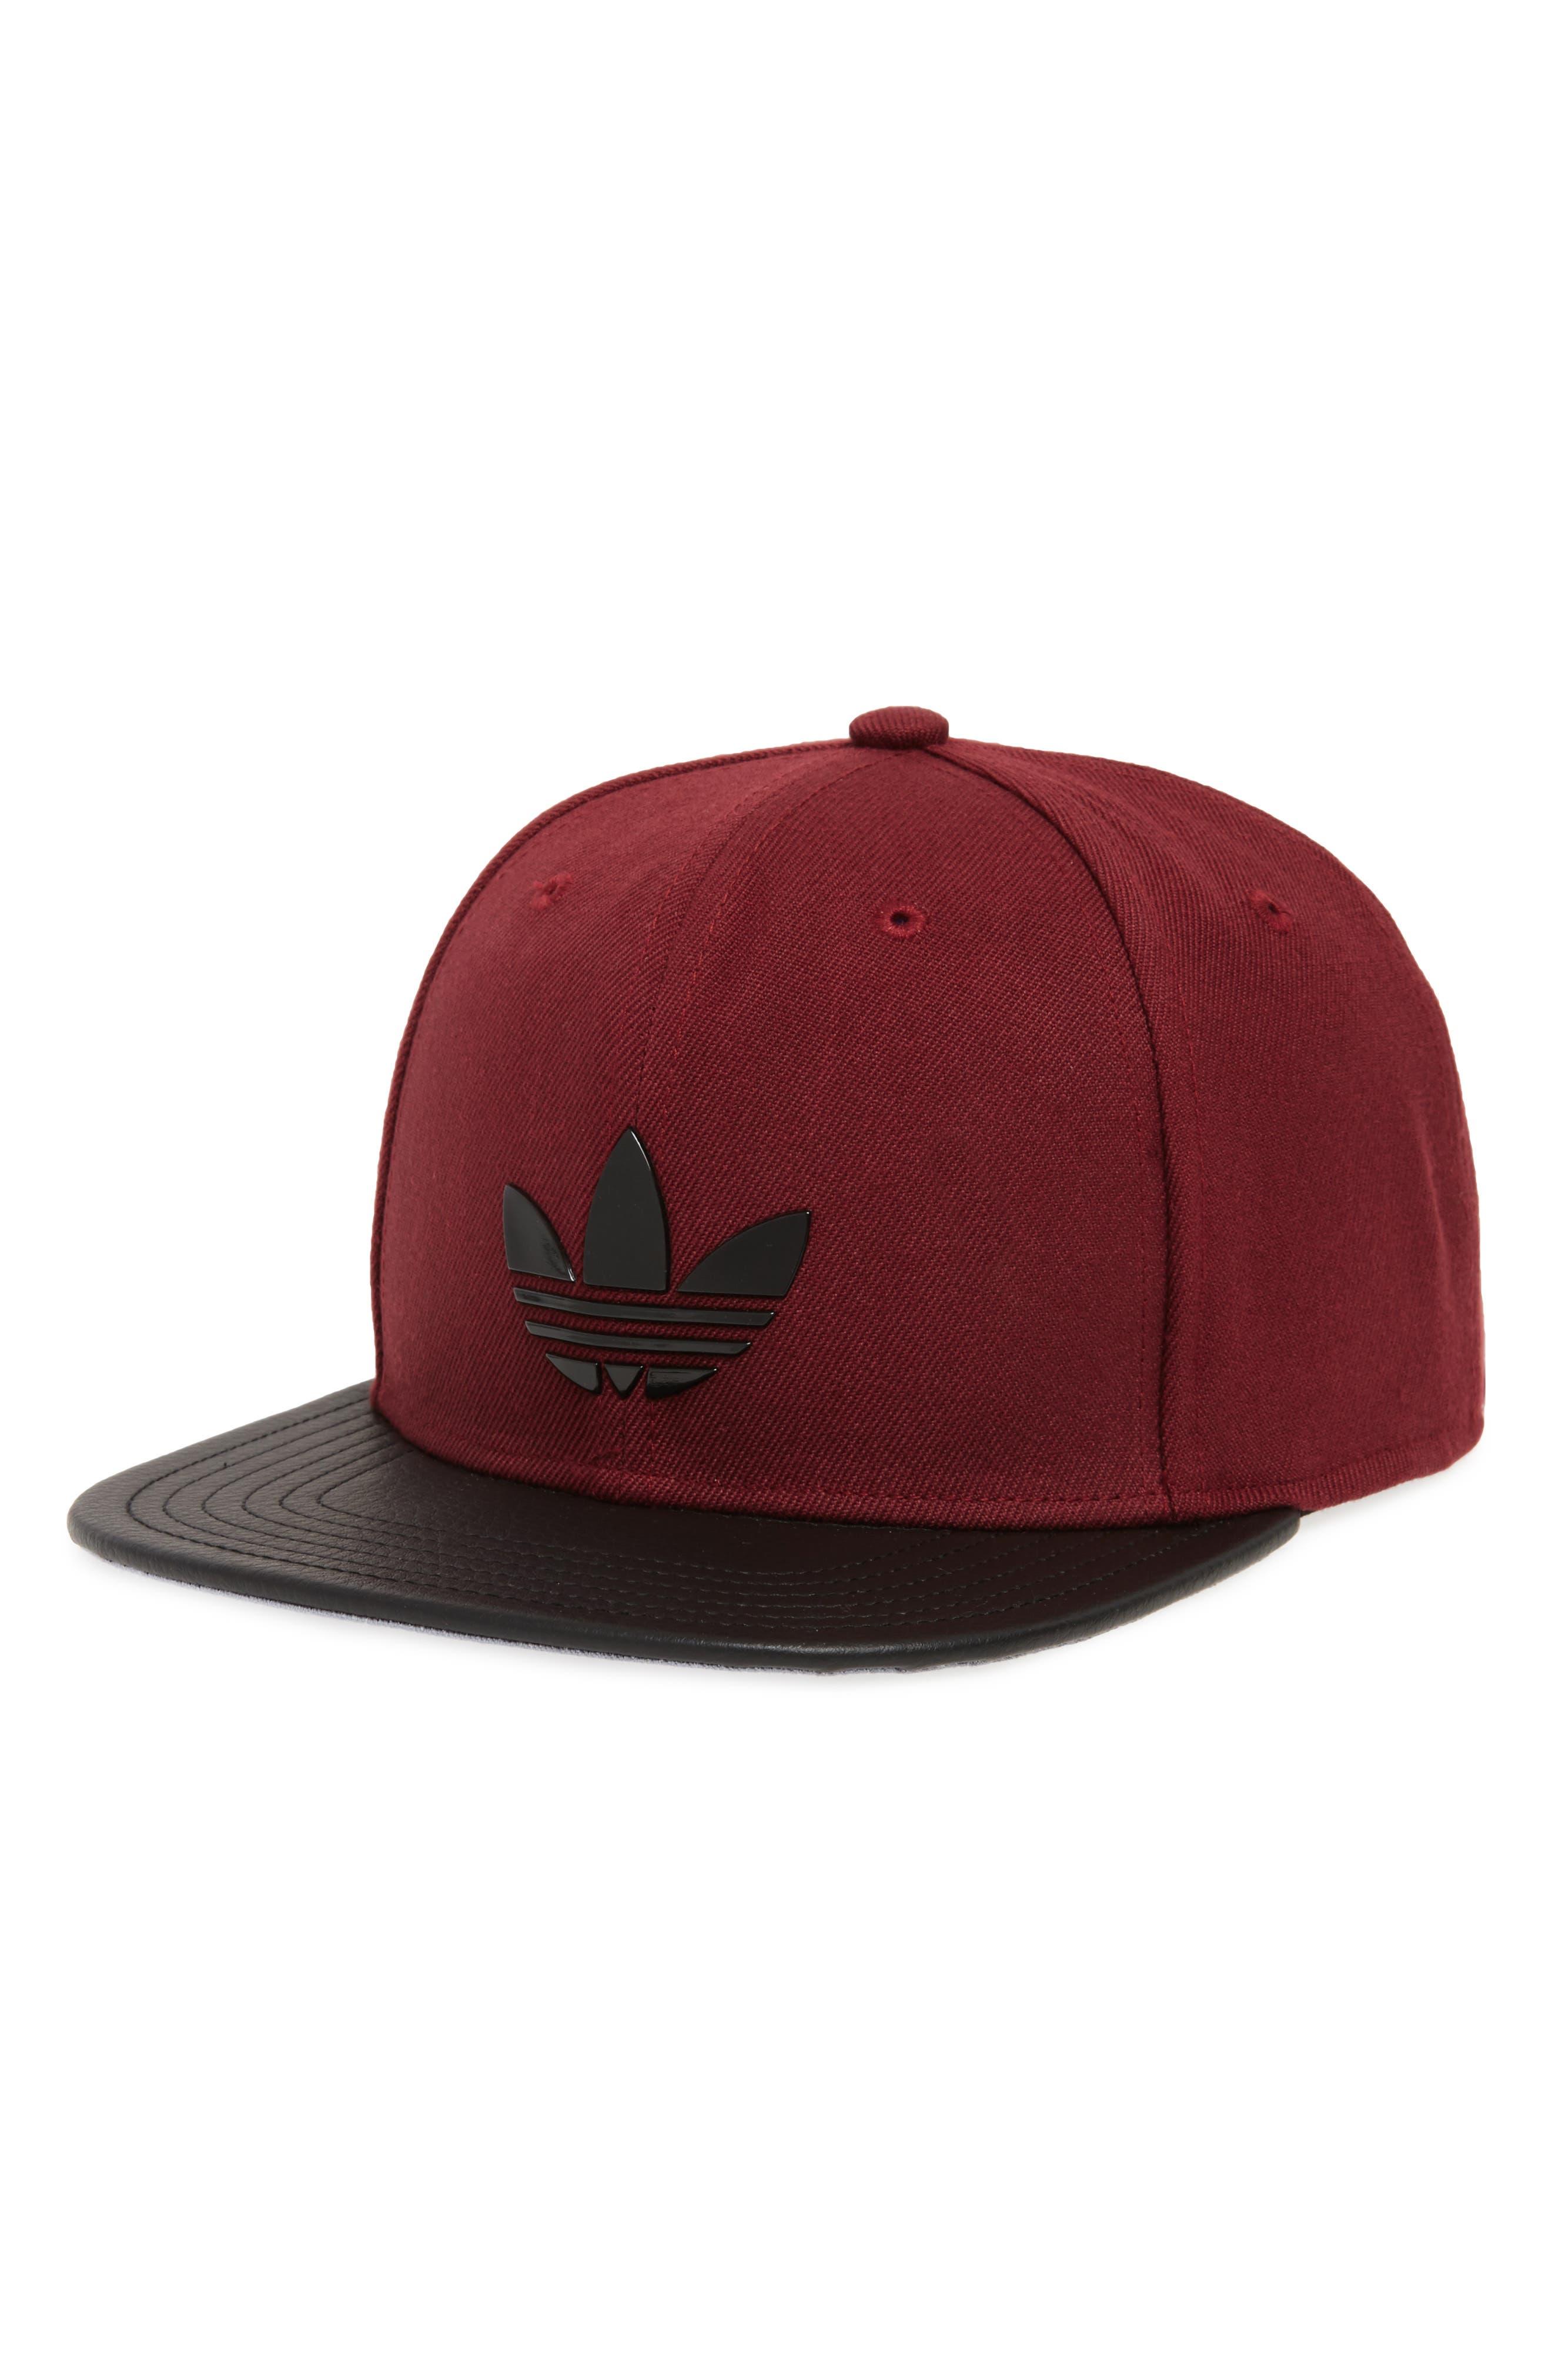 Ori Trefoil Plus Snapback Baseball Cap,                         Main,                         color, Maroon/ Black Pu